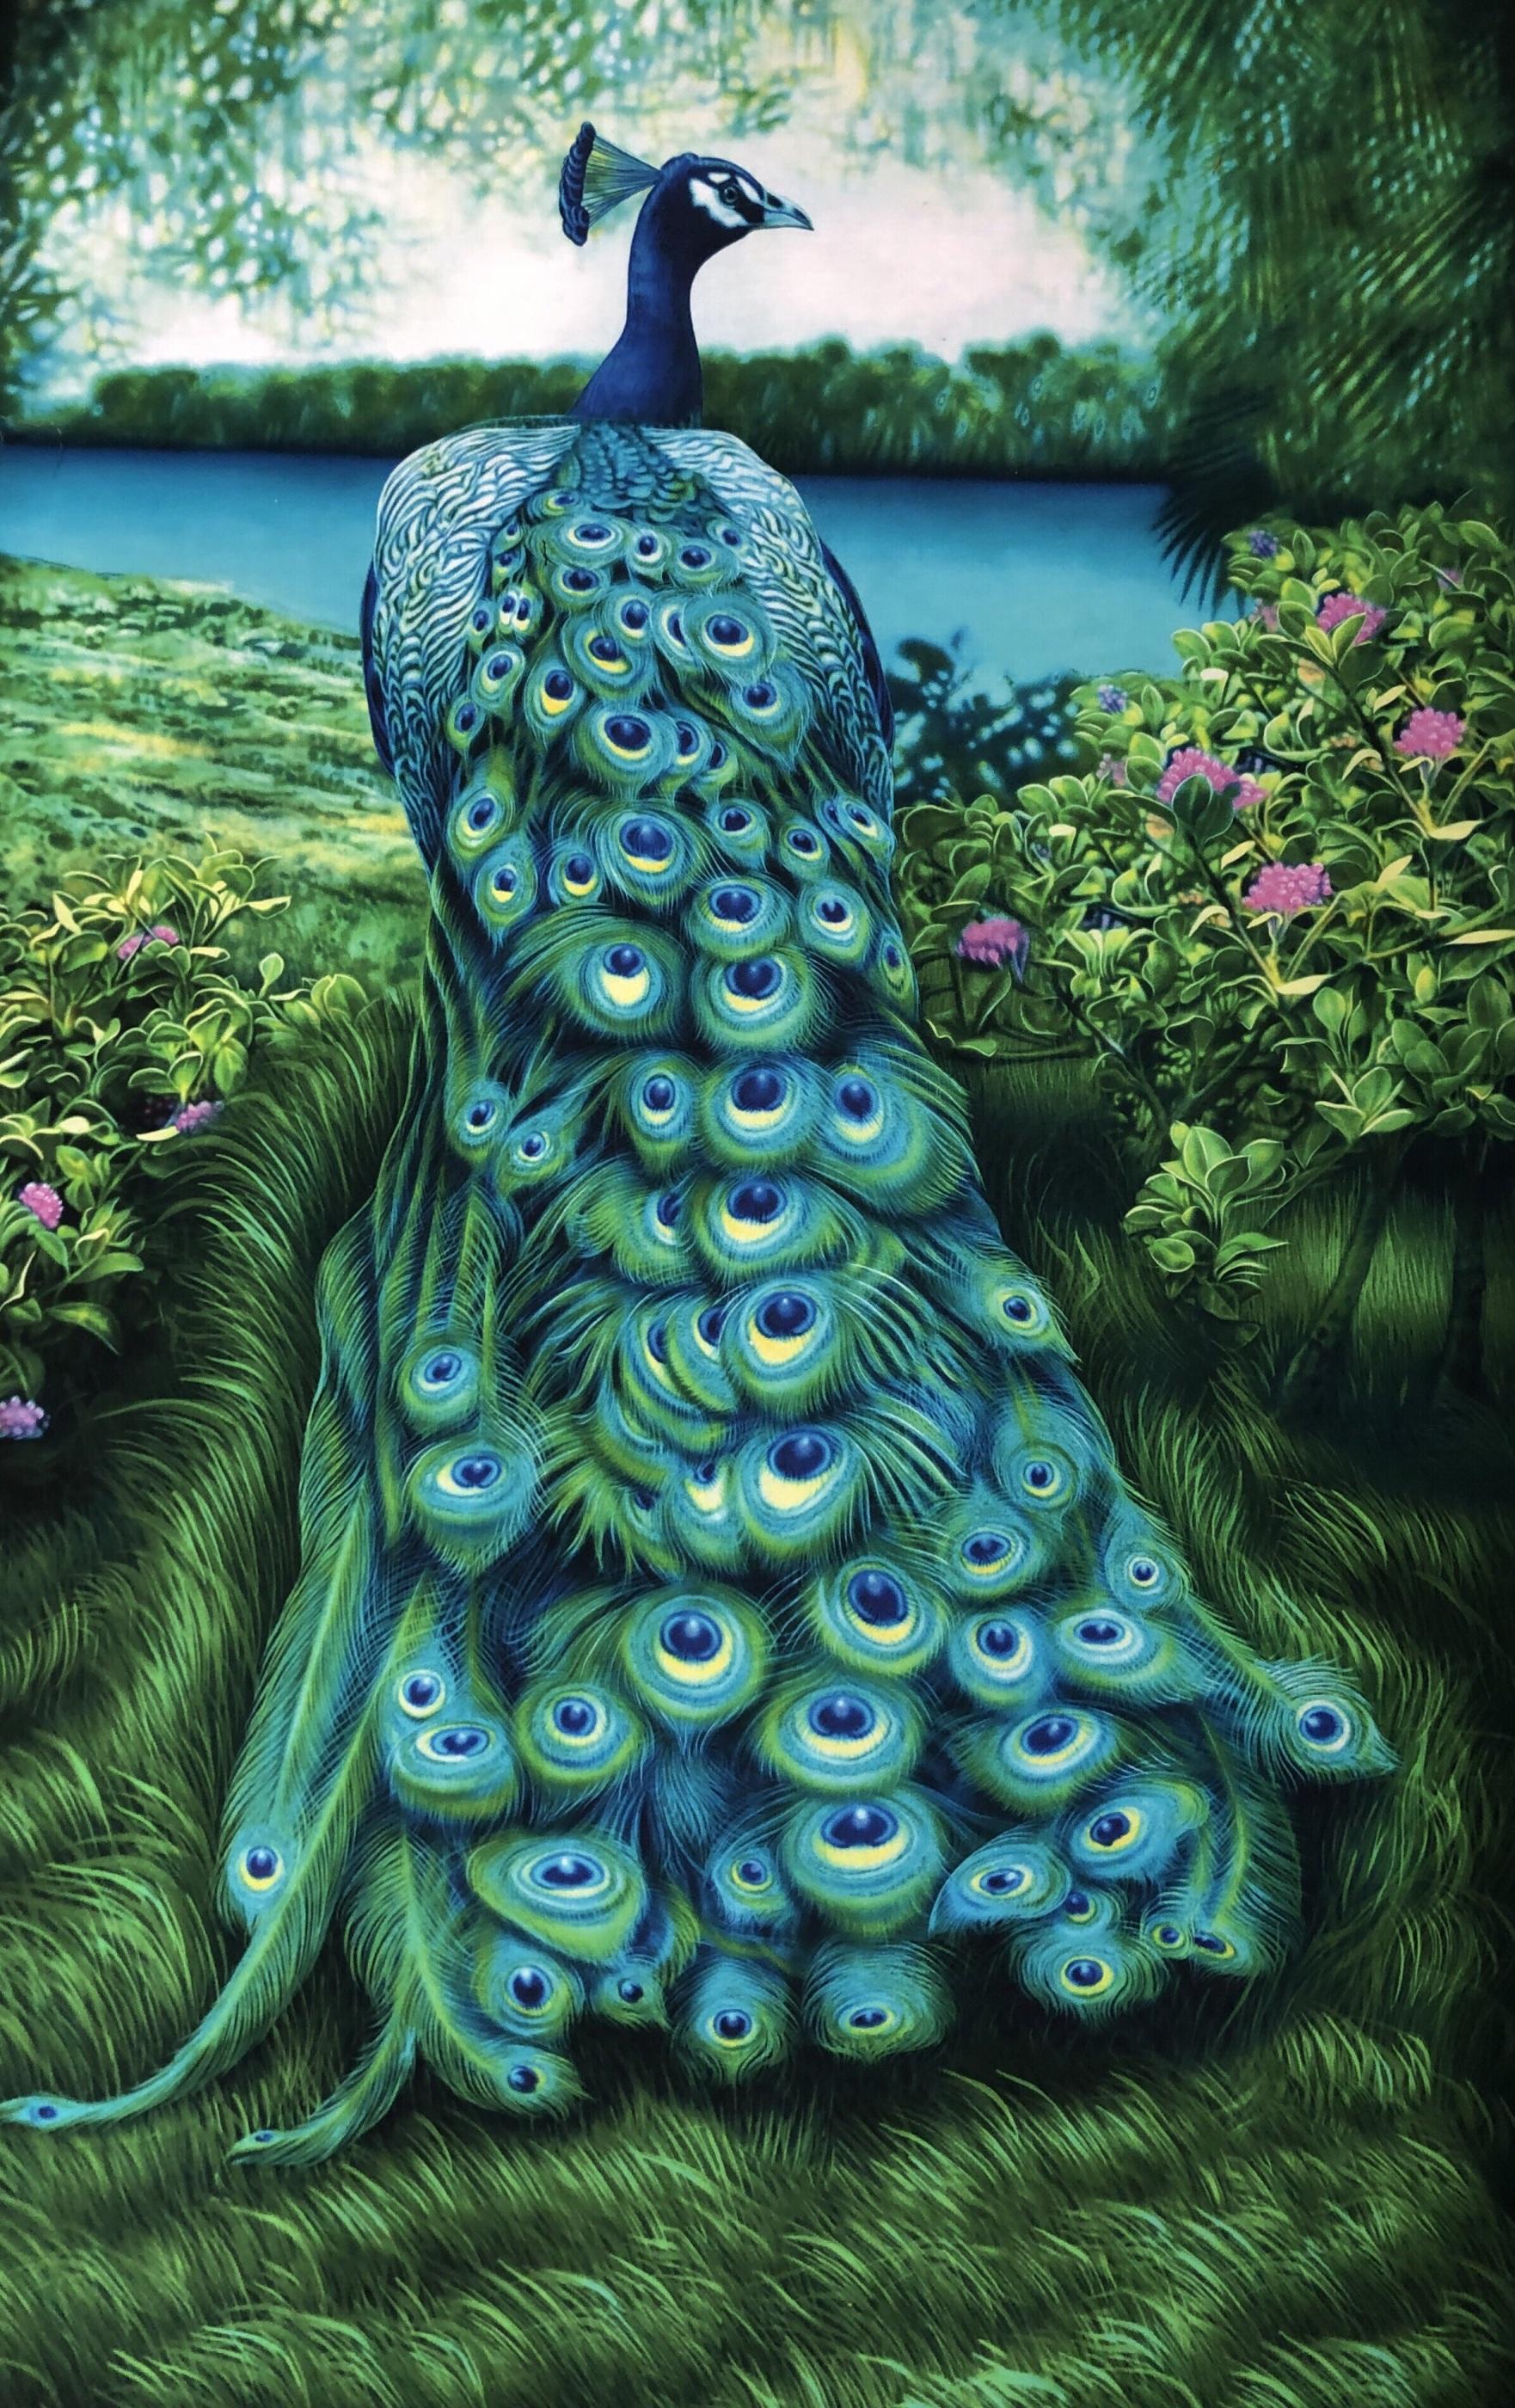 Magiskt herr påfågel blå grön rapport metervara Tyglust Laholm bomull